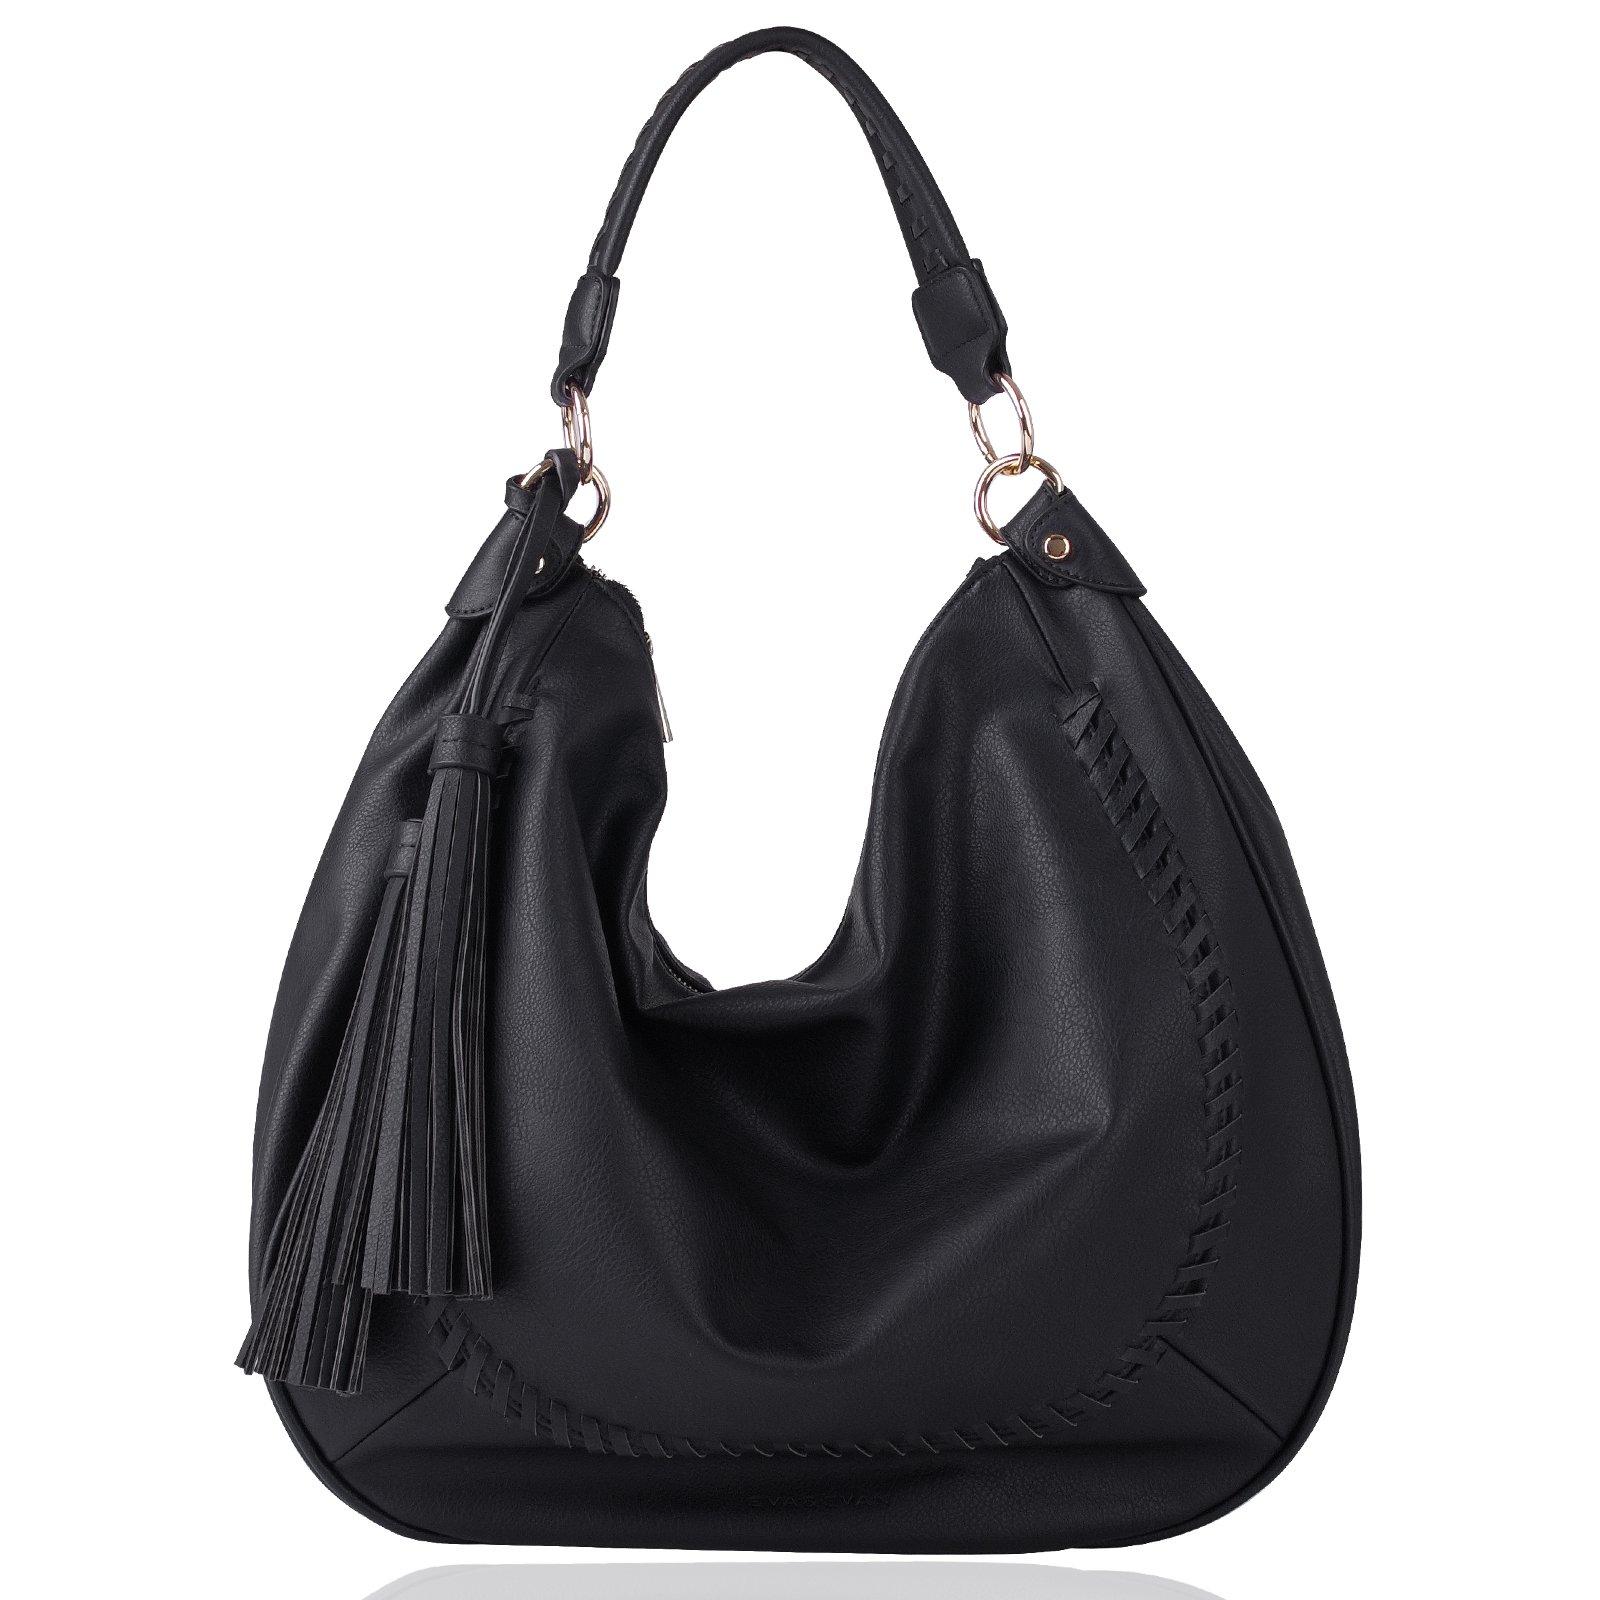 Eva & Evan Ladys Handbags Top-Handle Stylish Hobo Tote Bags Women PU Leather Shoulder Large Soft Satchel Tassels Bags (Black)